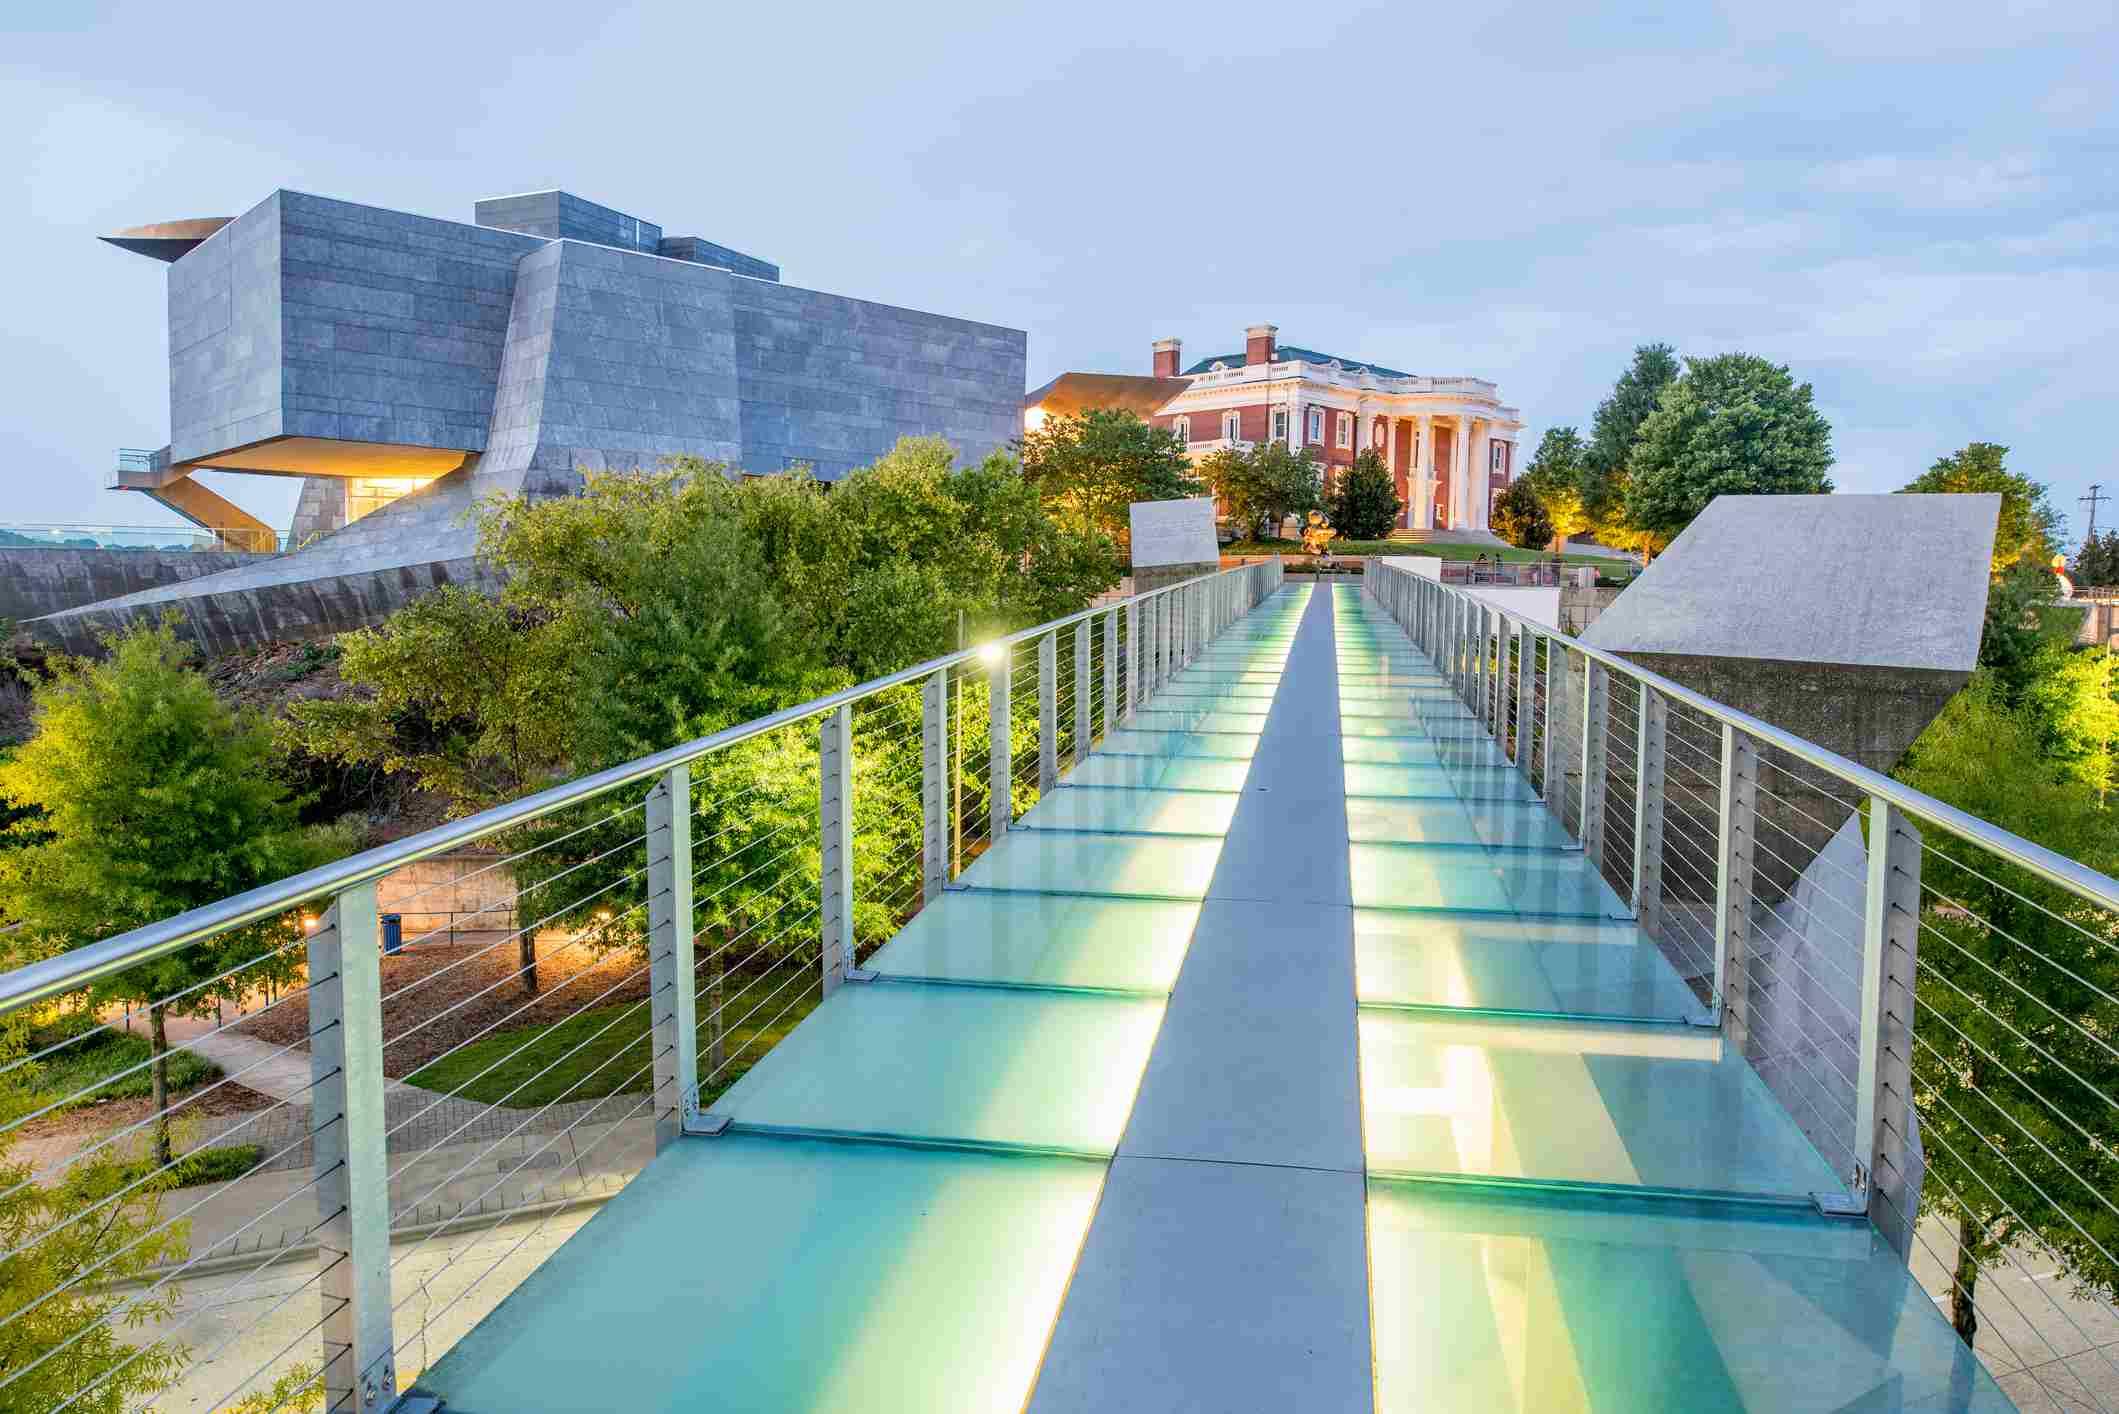 Glass Pedestrian Bridge and Hunter Museum, Chattanooga, Tennessee